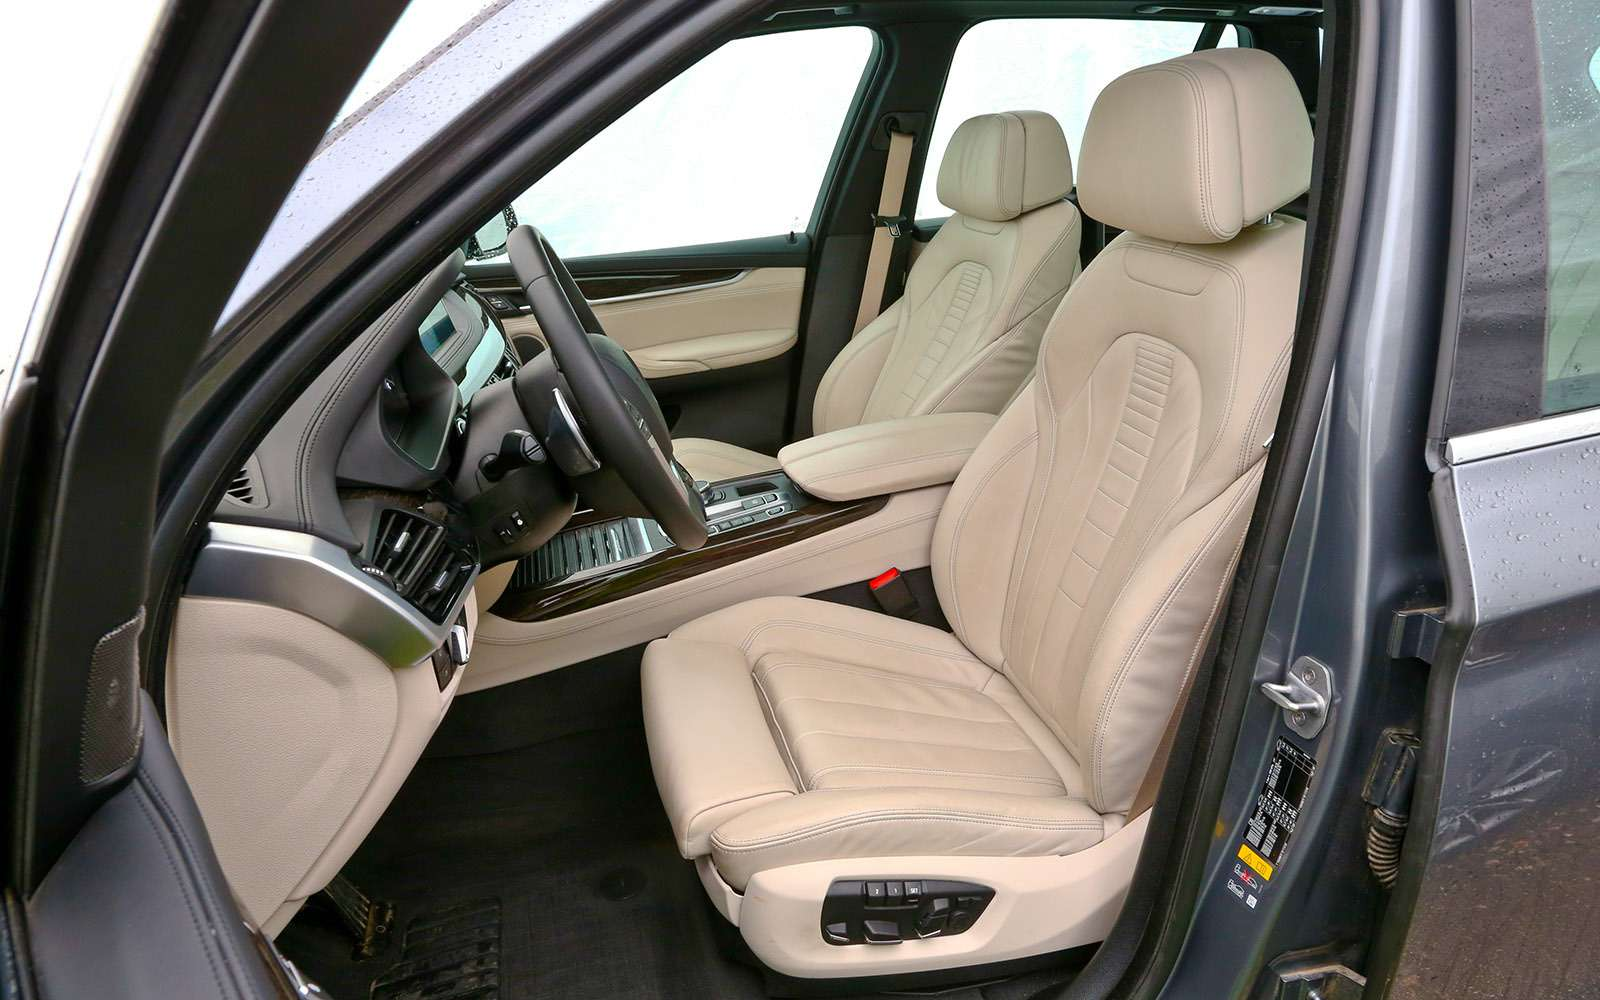 Новый Land Rover Discovery против конкурентов— тест ЗР— фото 784688